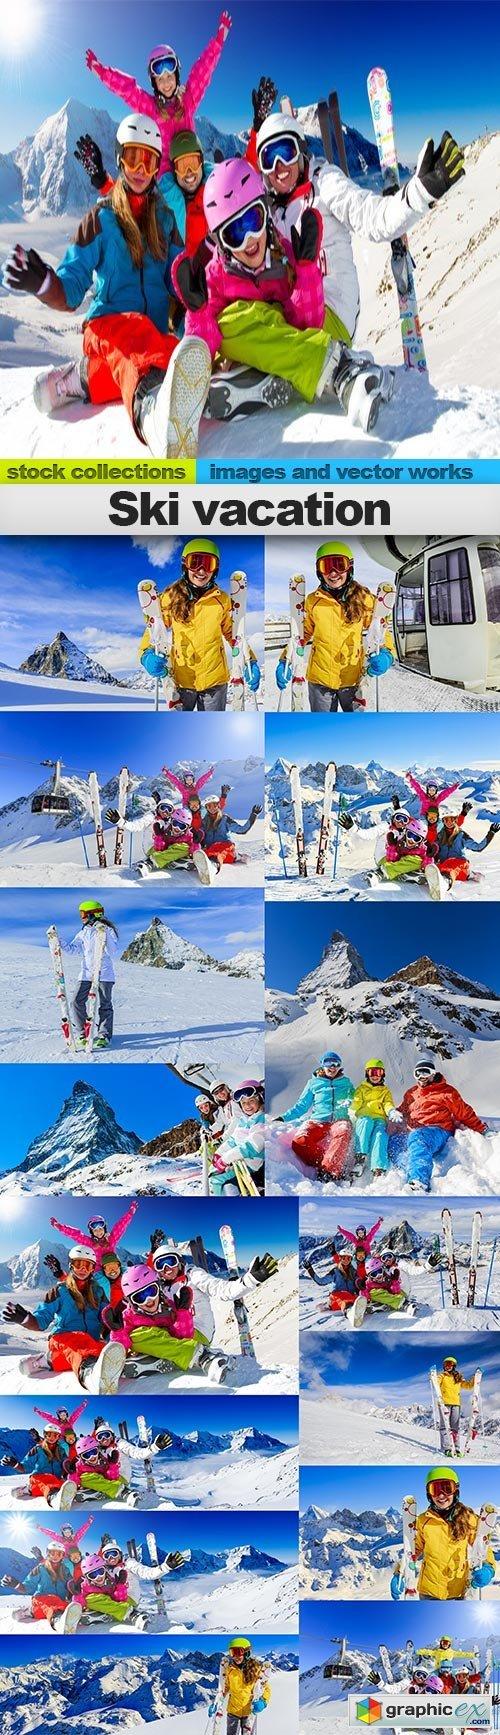 Ski vacation, 15 x UHQ JPEG